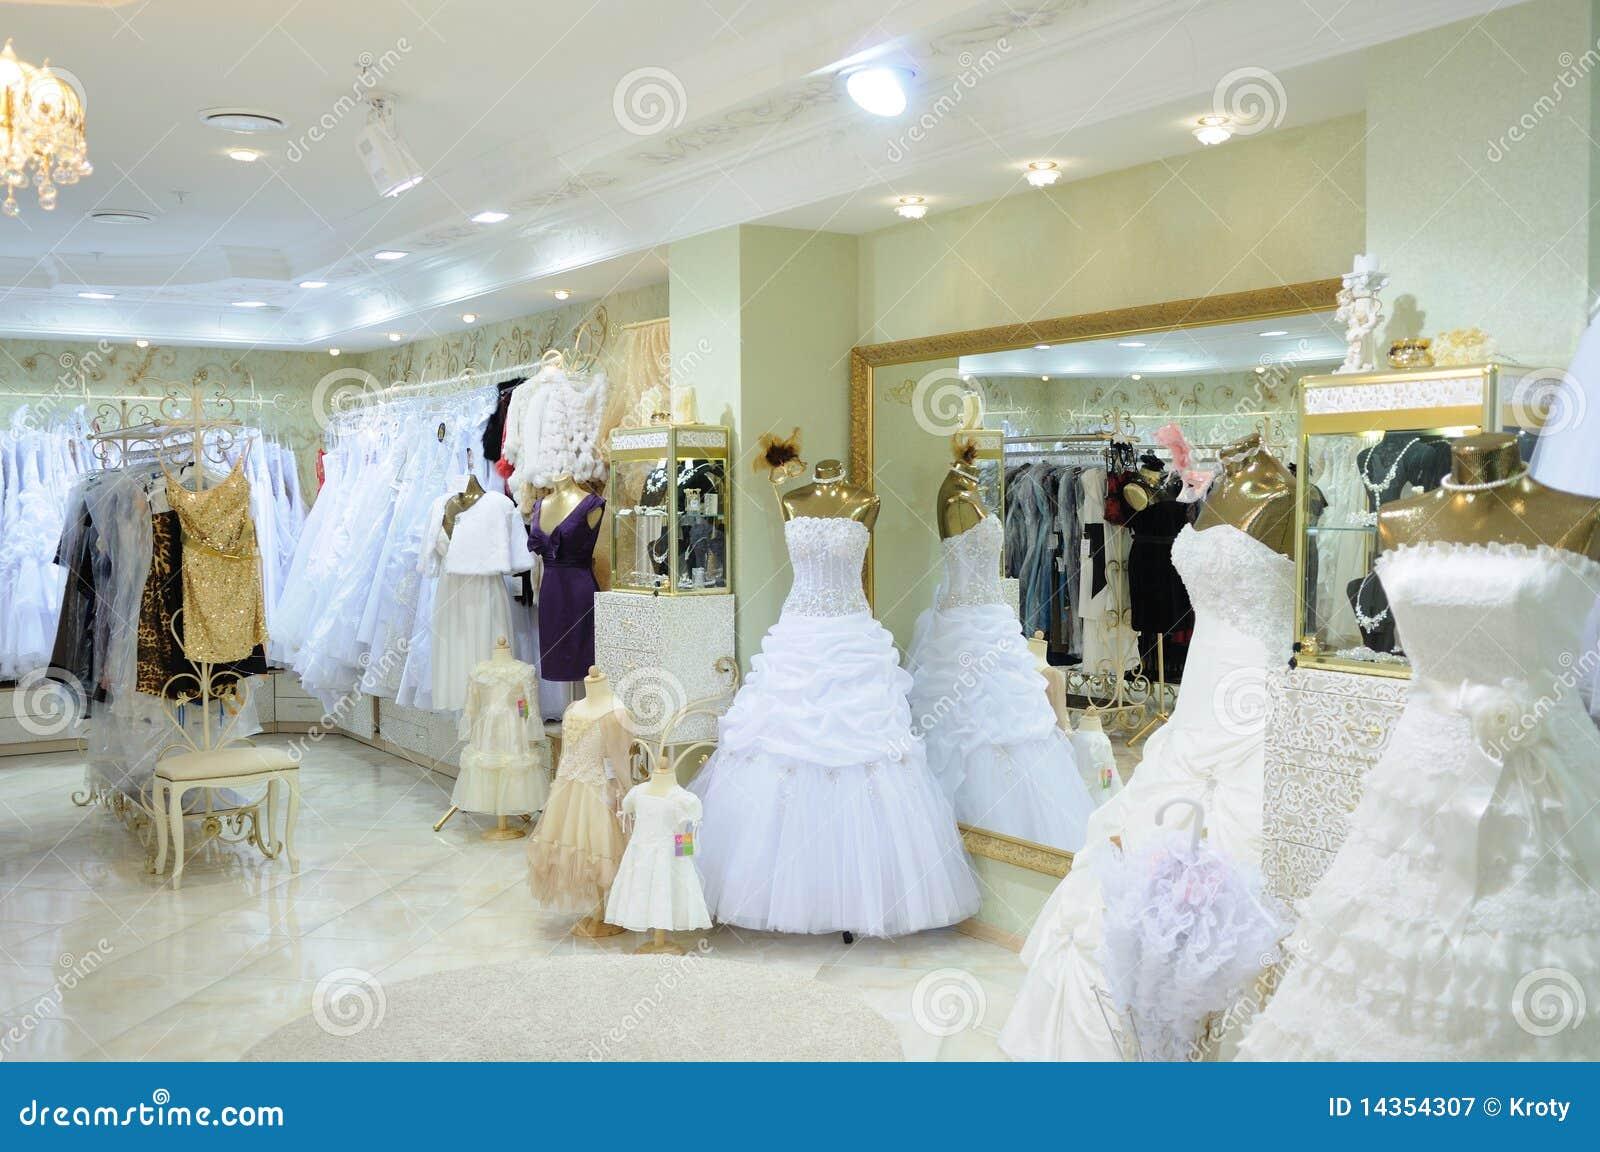 ff922c641545 Interior Of Wedding Fashion Store Stock Image - Image of beautiful ...